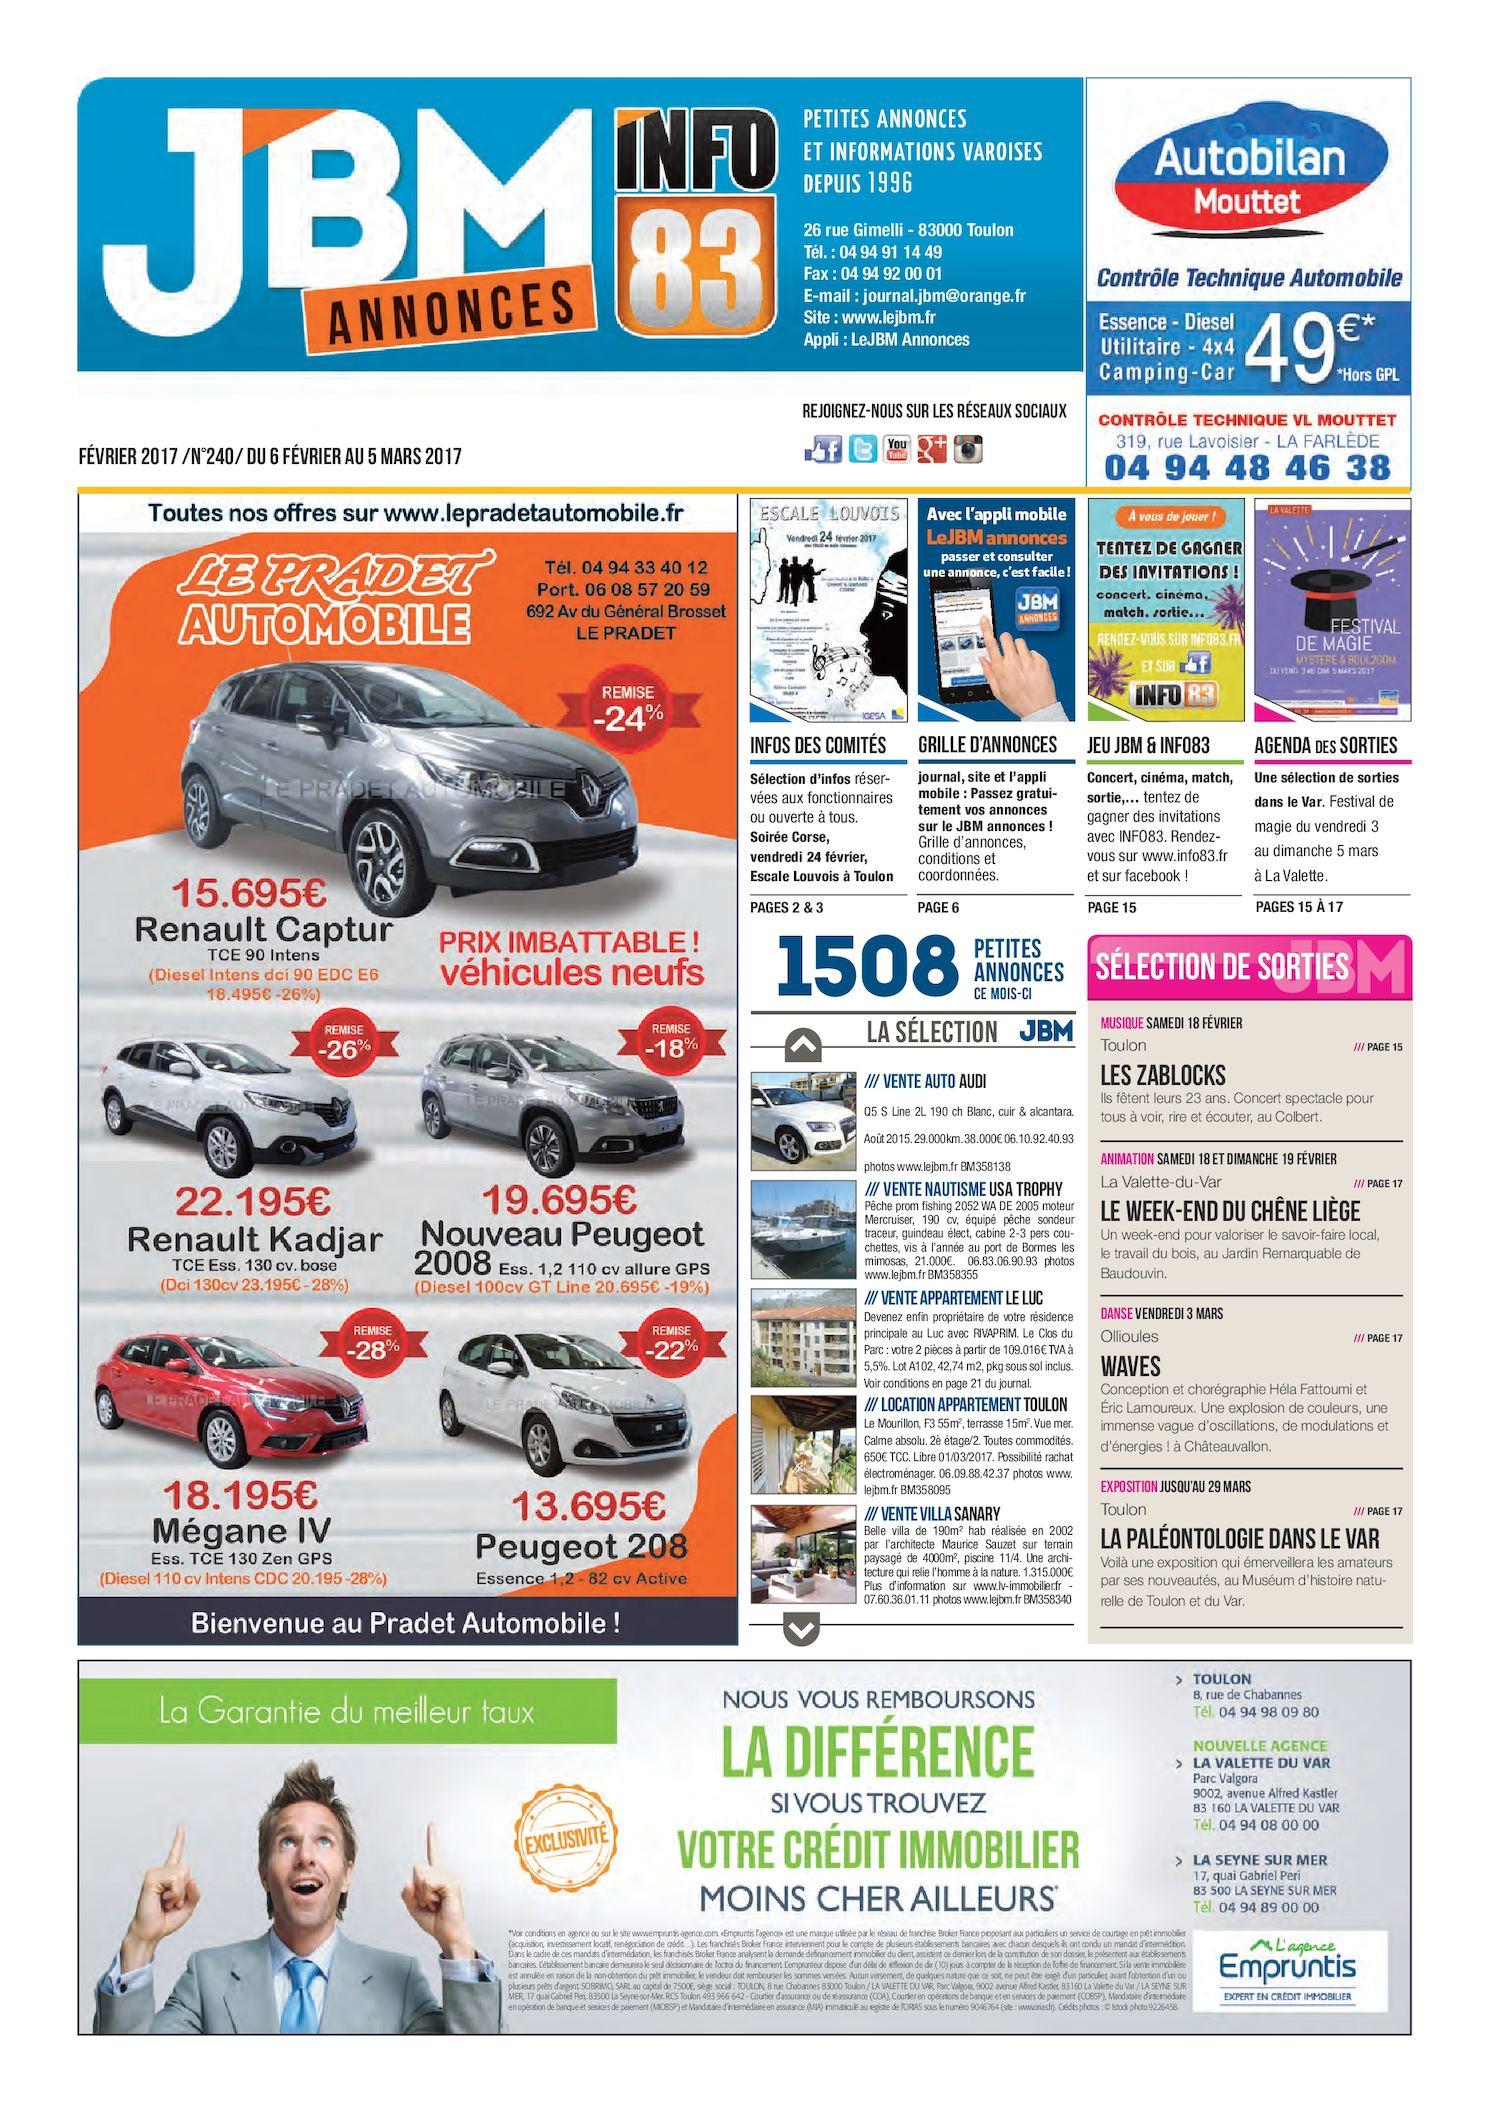 Calaméo - Journal JBM Annonces n°240 février 2017 fa8b9da060e